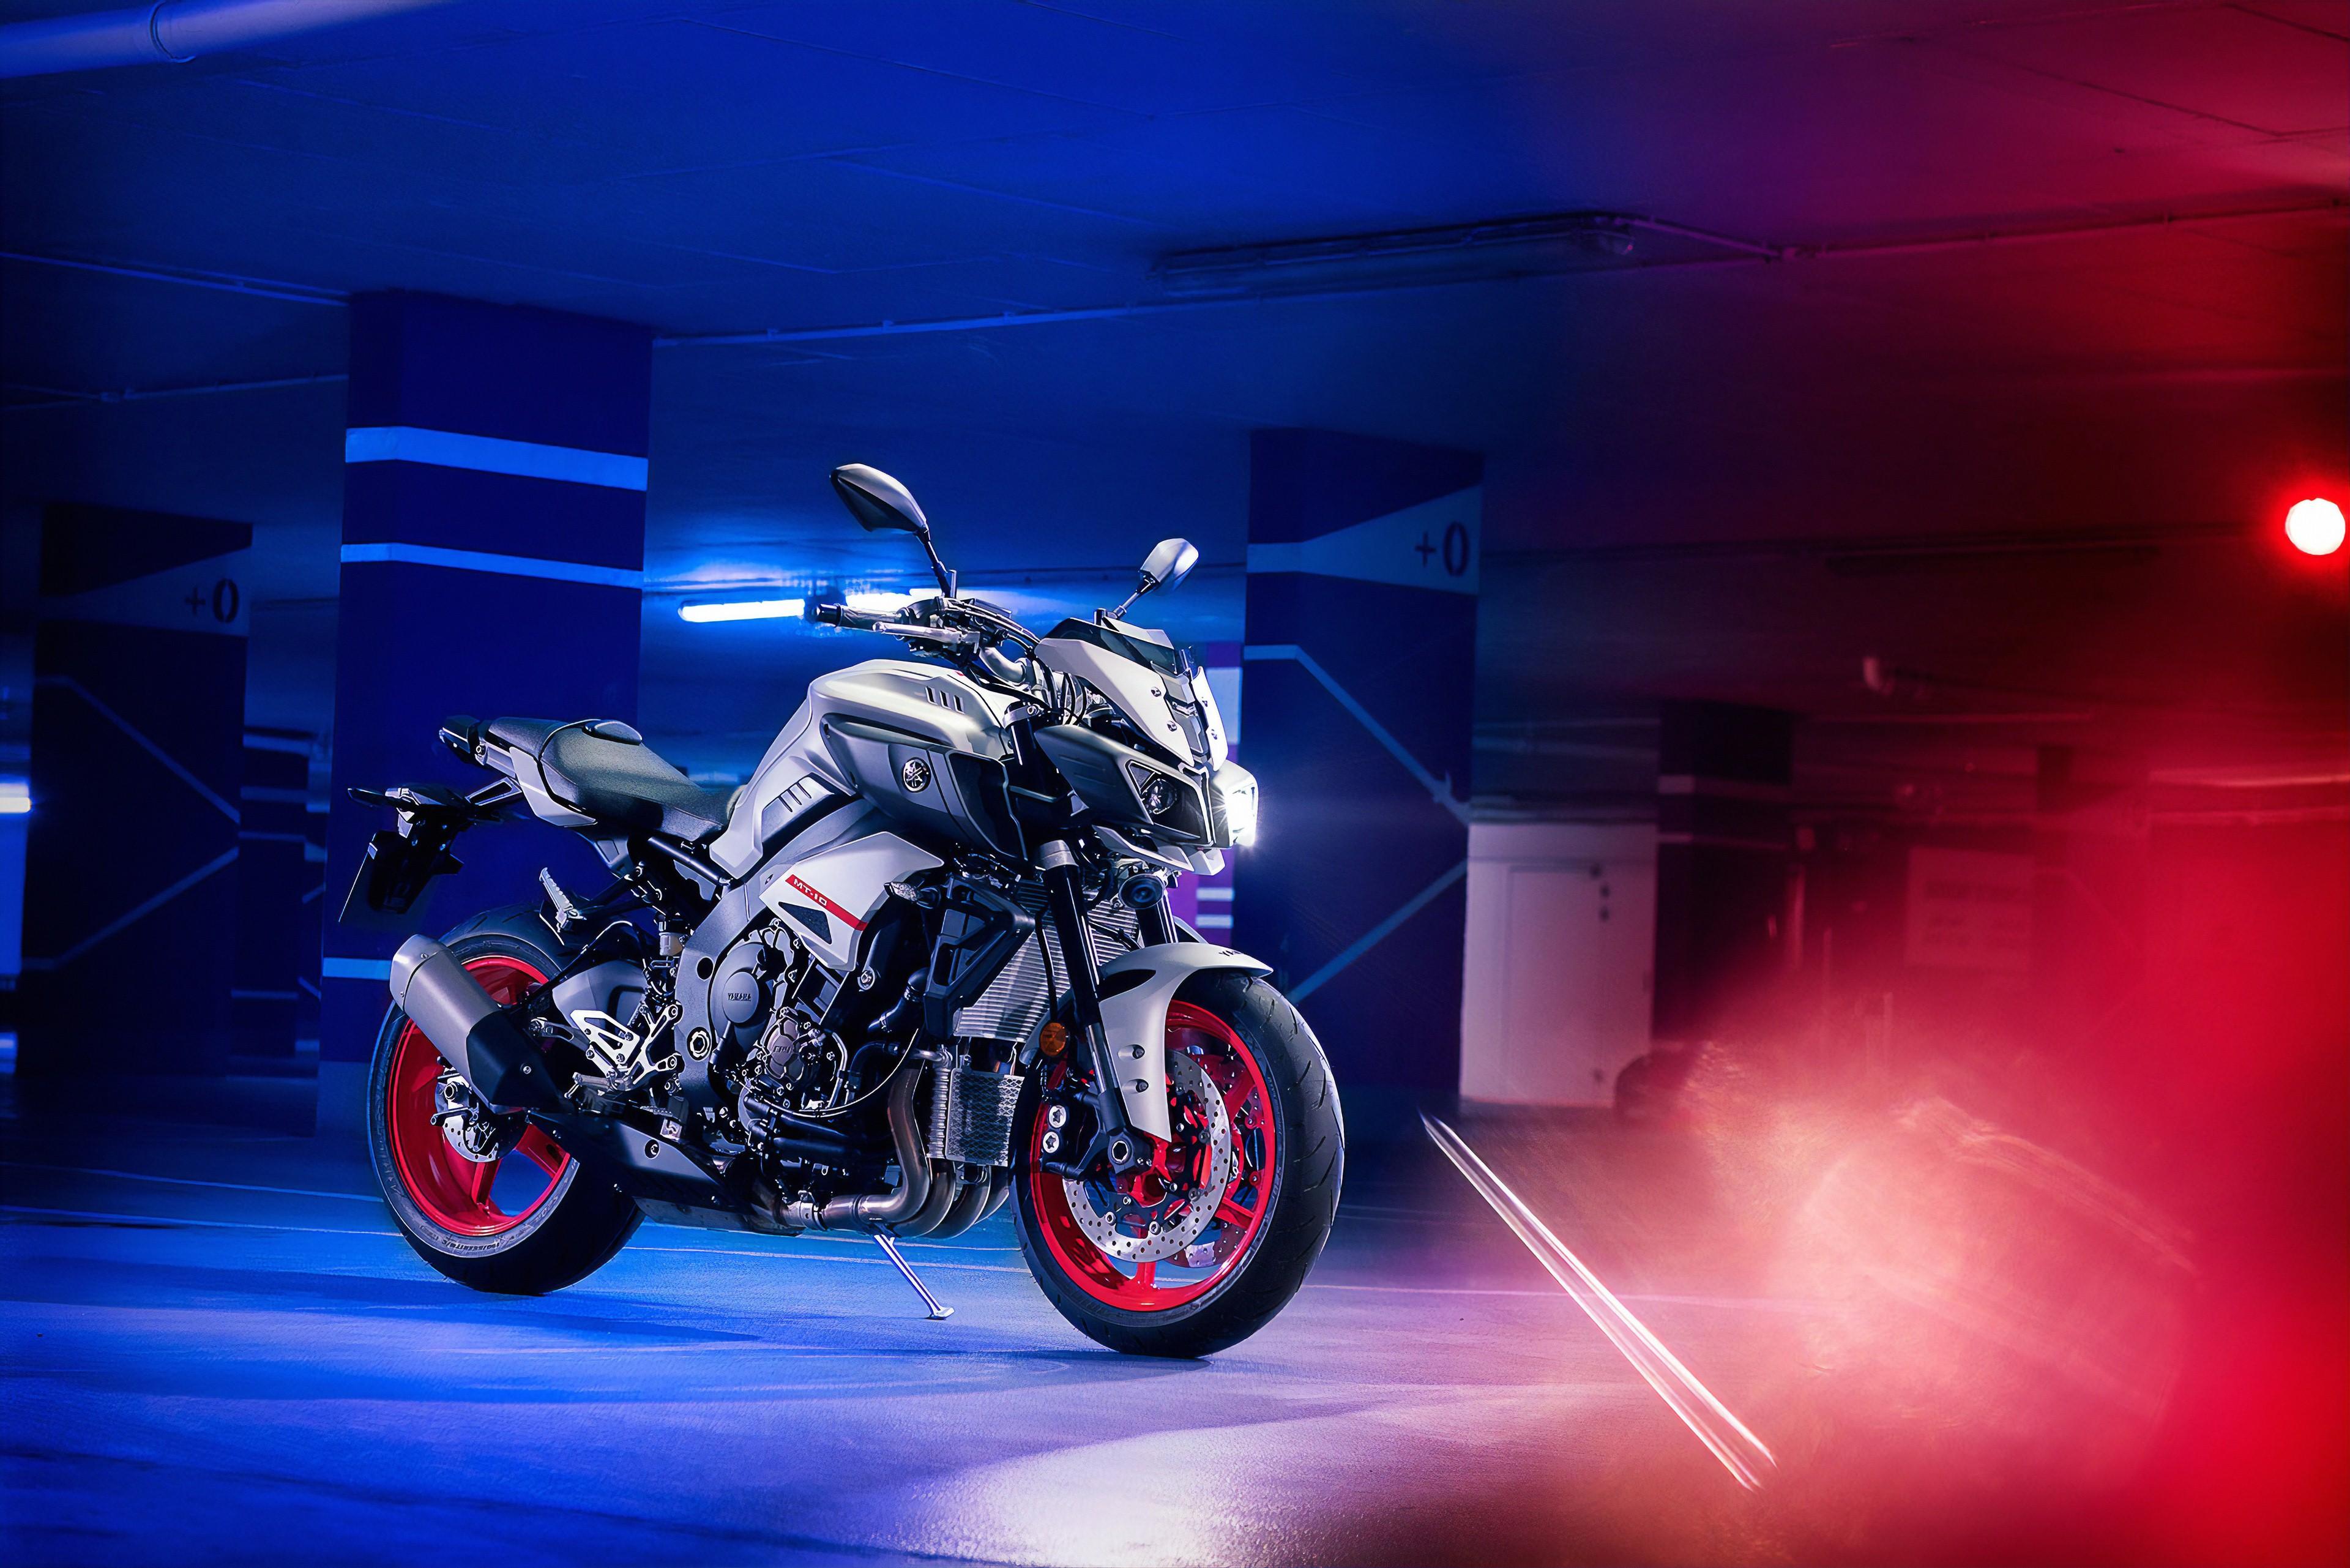 2019 Yamaha Mt 10 Bike 4k Wallpaper Yamaha Mt 10 2020 2845718 Hd Wallpaper Backgrounds Download